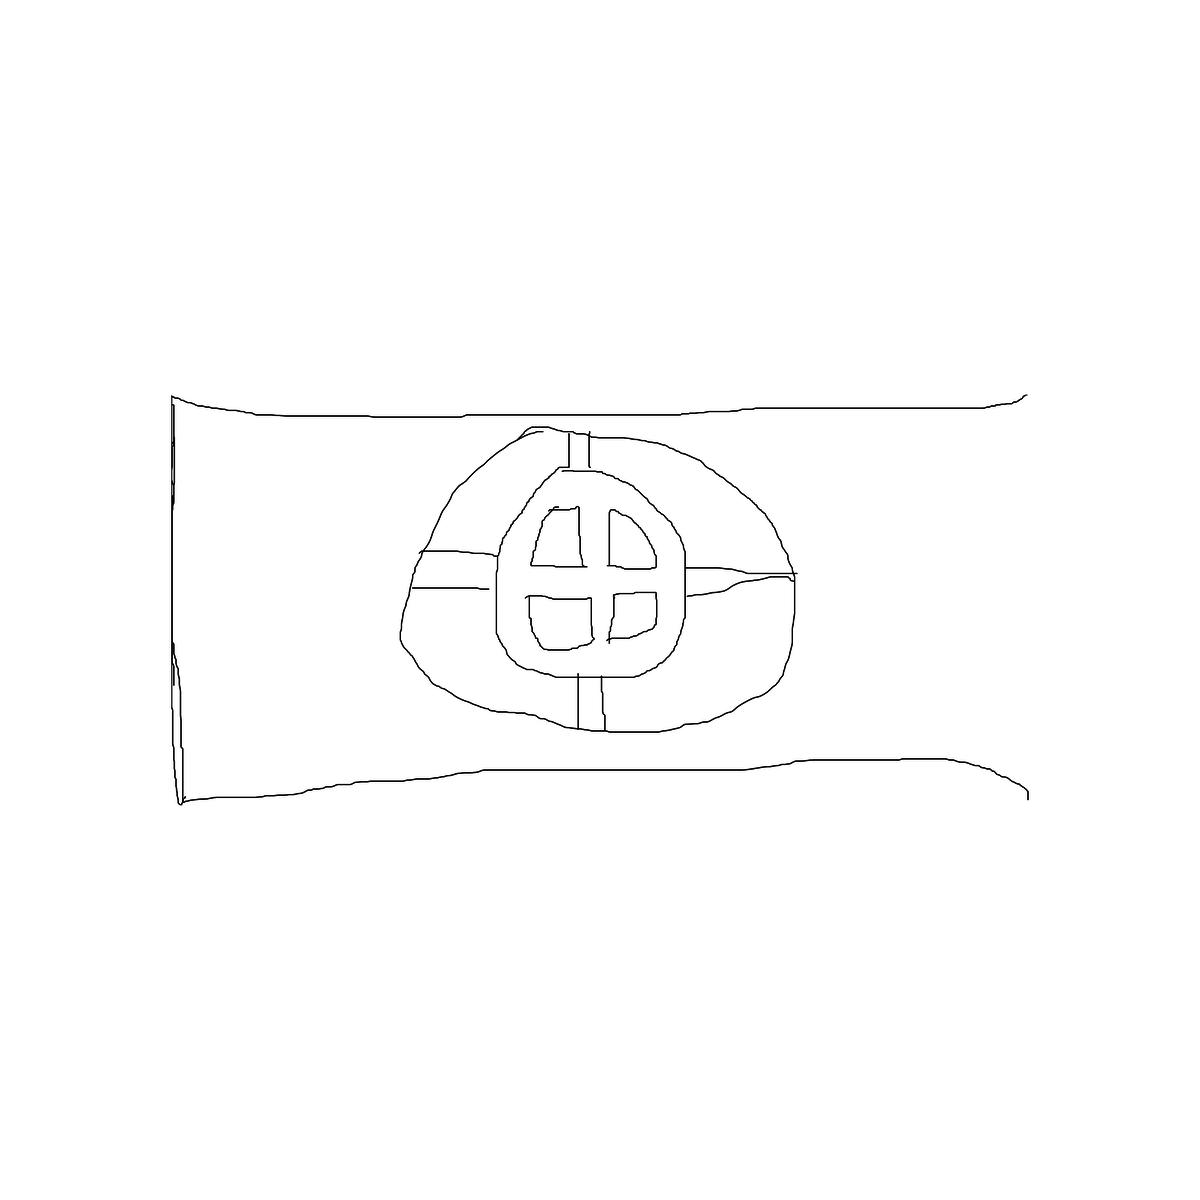 BAAAM drawing#23199 lat:54.5877418518066400lng: -5.9346942901611330